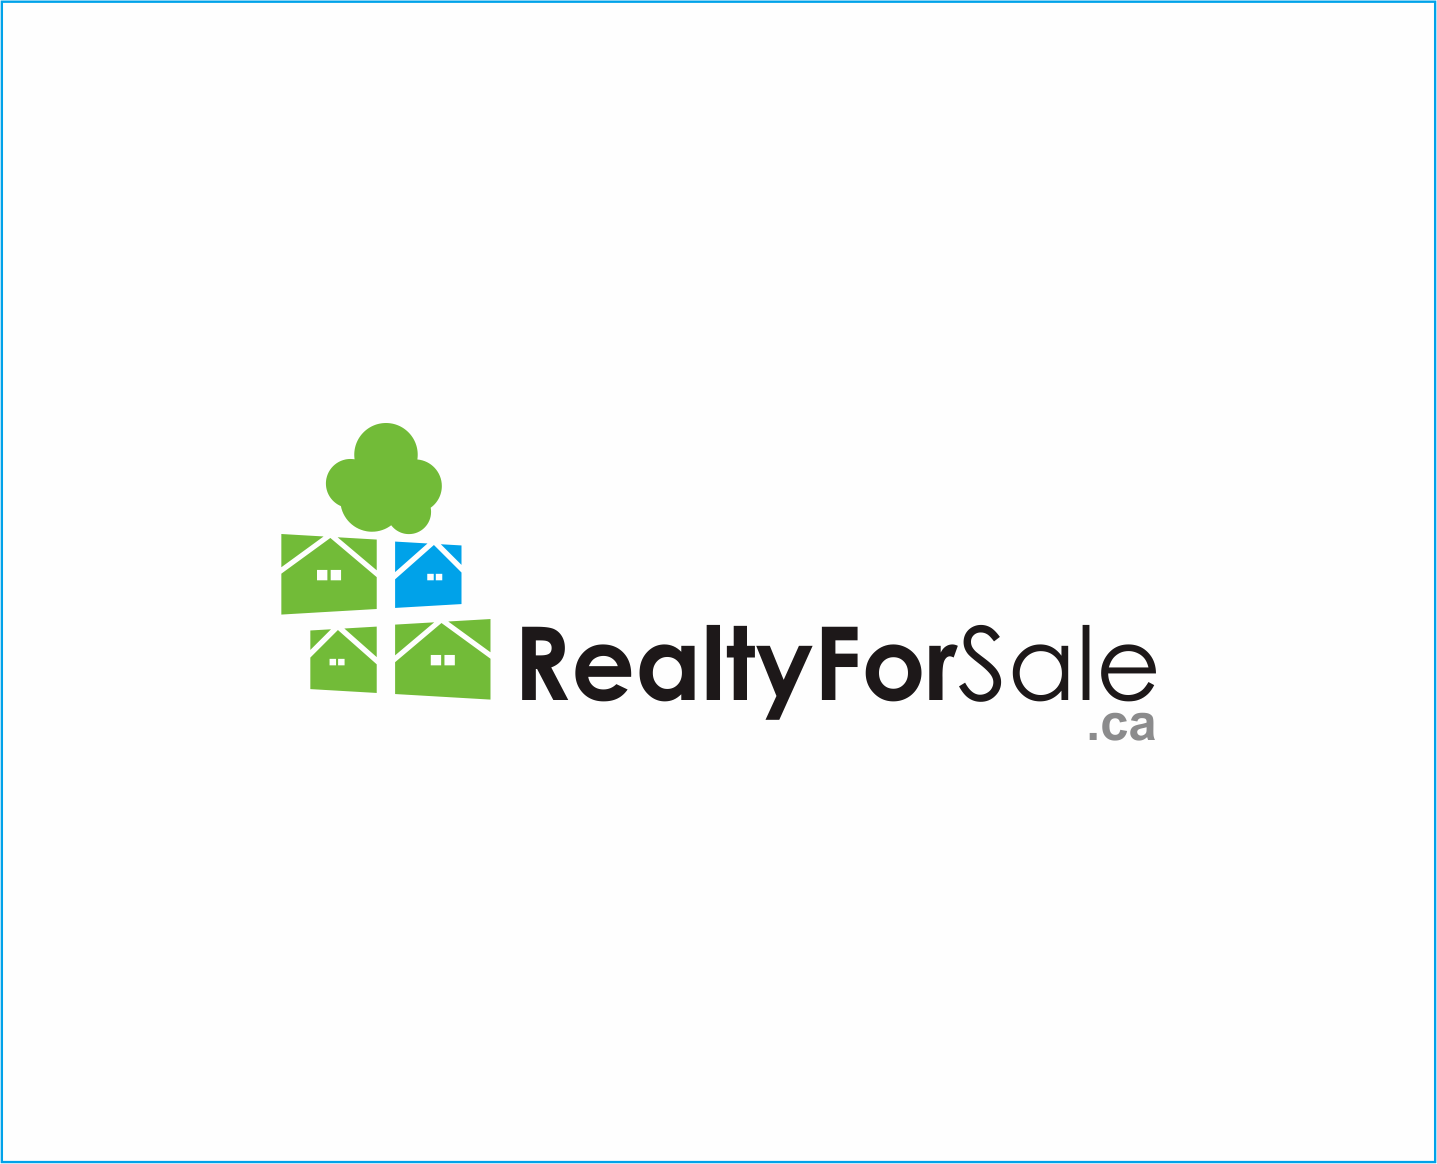 Logo Design by Armada Jamaluddin - Entry No. 91 in the Logo Design Contest Inspiring Logo Design for RealtyForSale.ca.